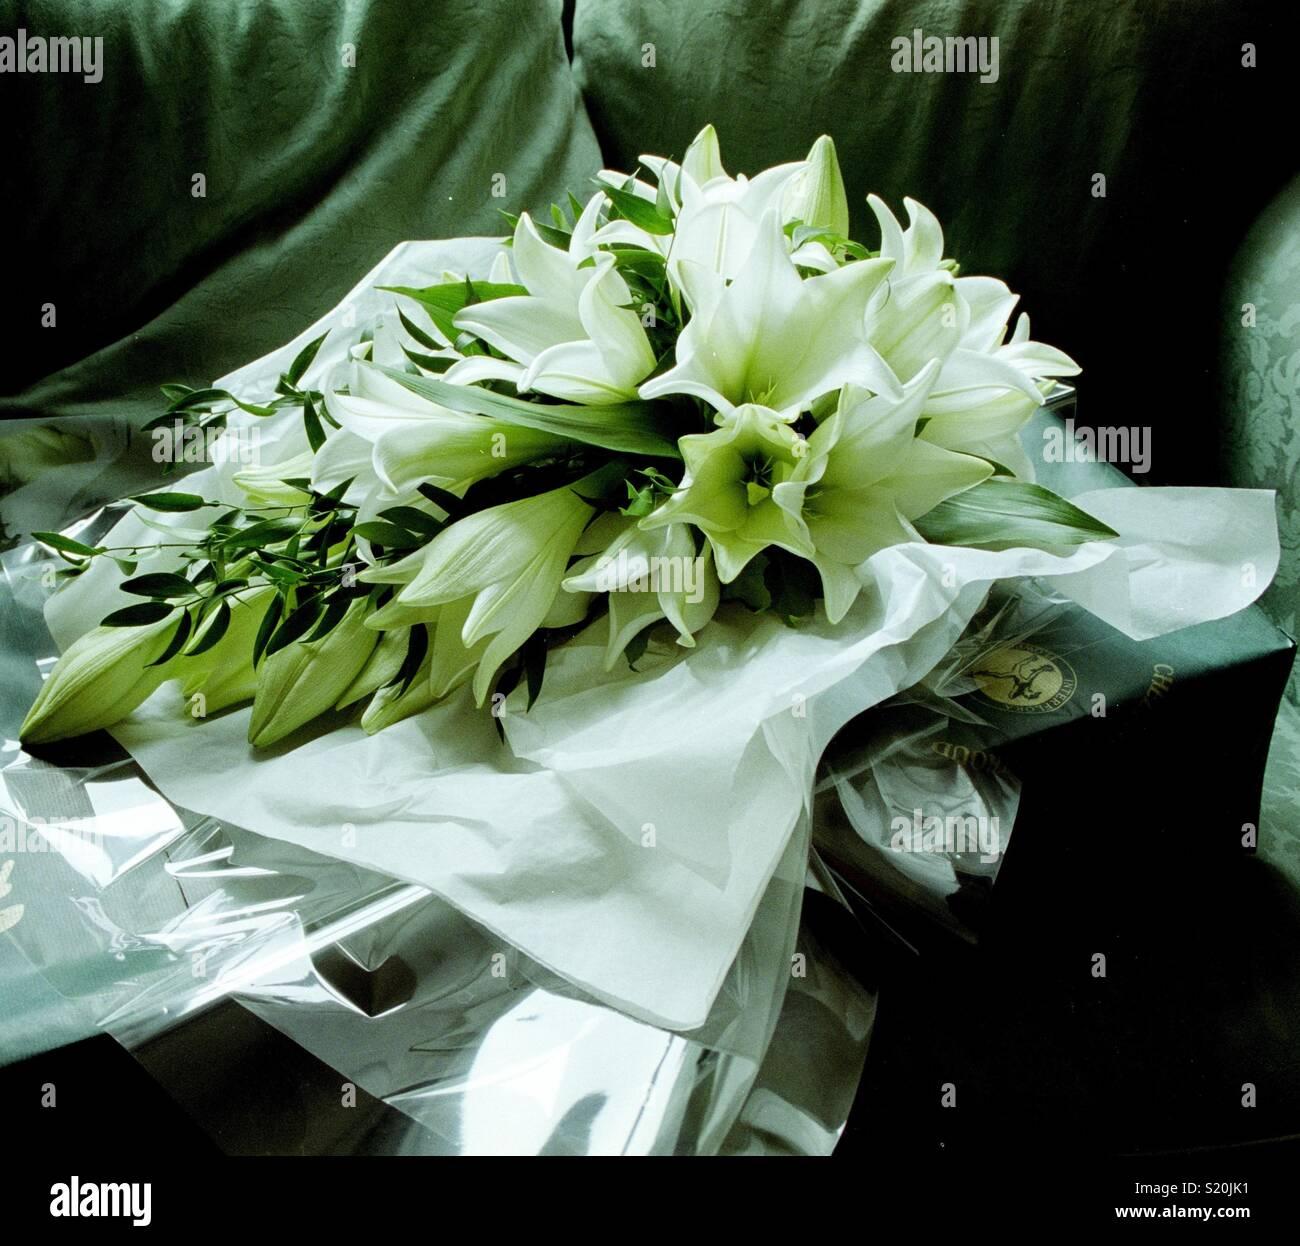 White Lily Wedding Bouquet Stock Photo Alamy